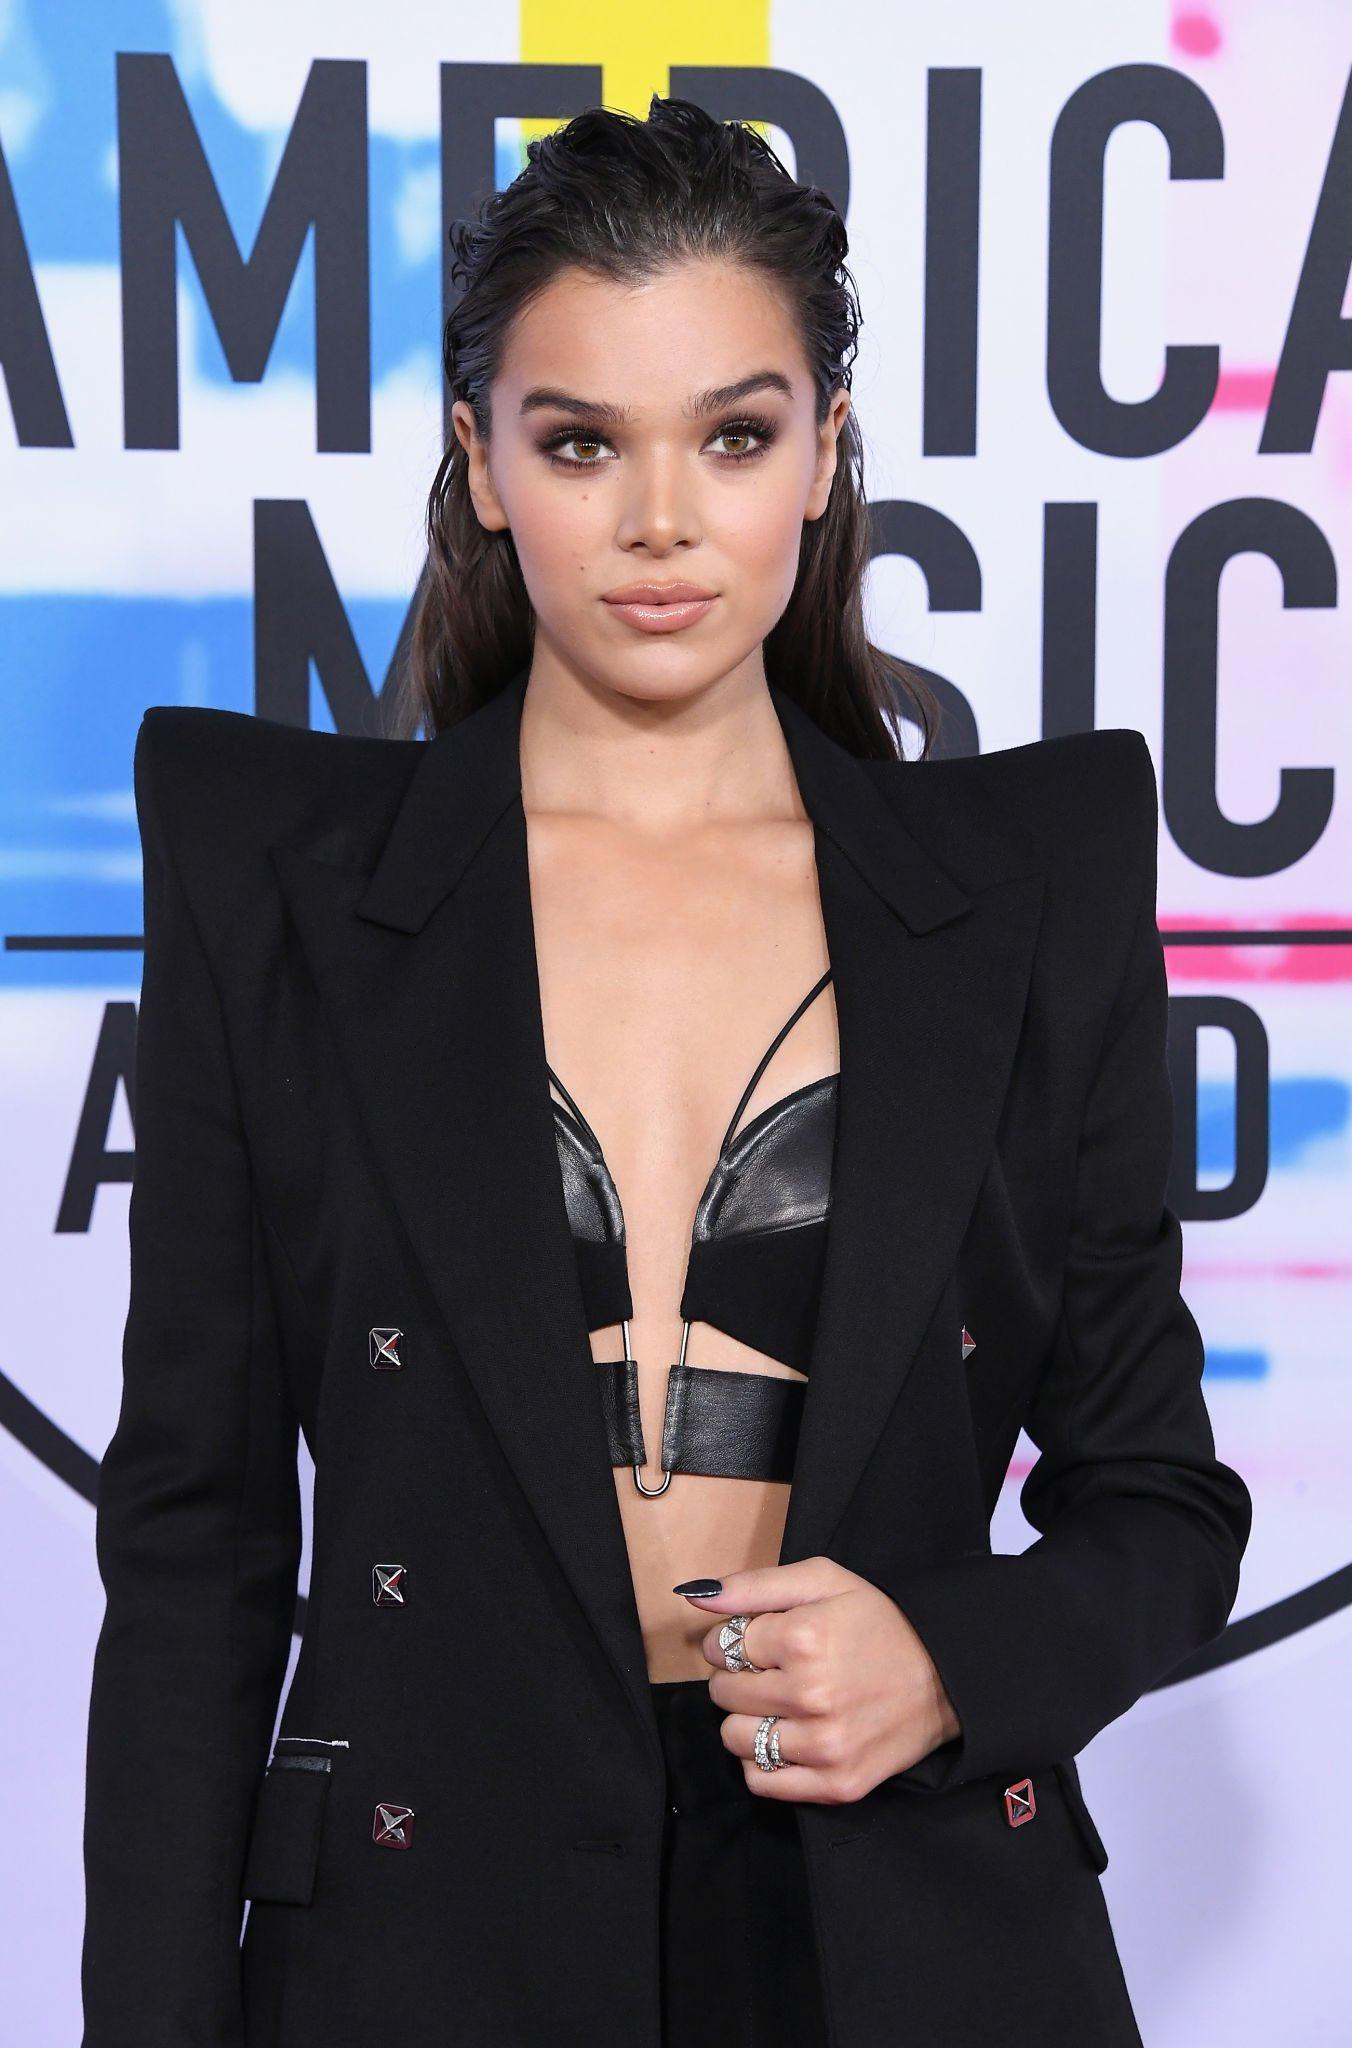 American Music Awards ��  #LetMeGo https://t.co/P4qLOkhsPg